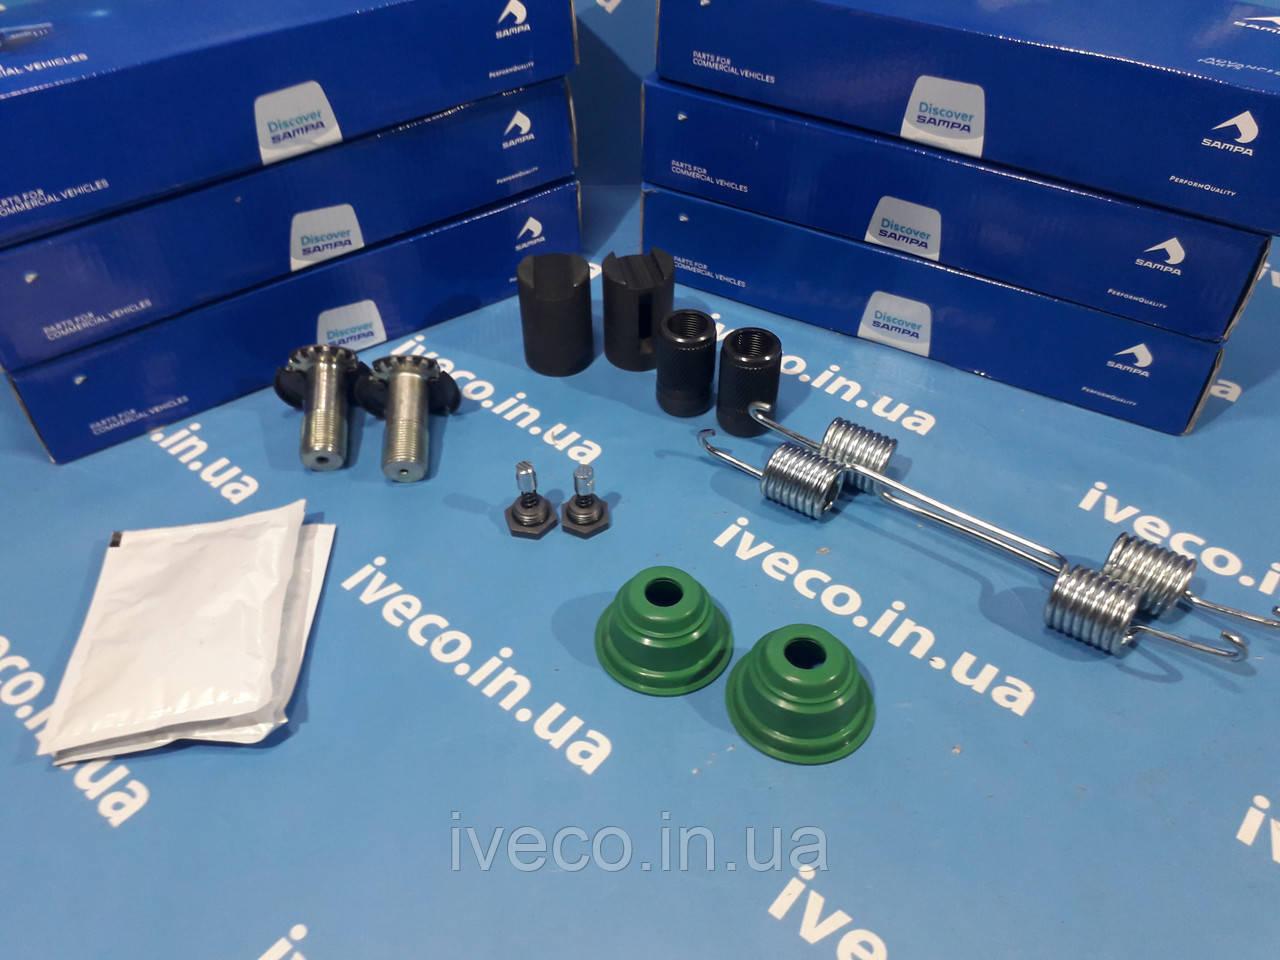 Ремкомплект саморегулятора Iveco Trakker EuroTrakker EuroTech EuroStar Ивеко 42536197 42550961 060.522